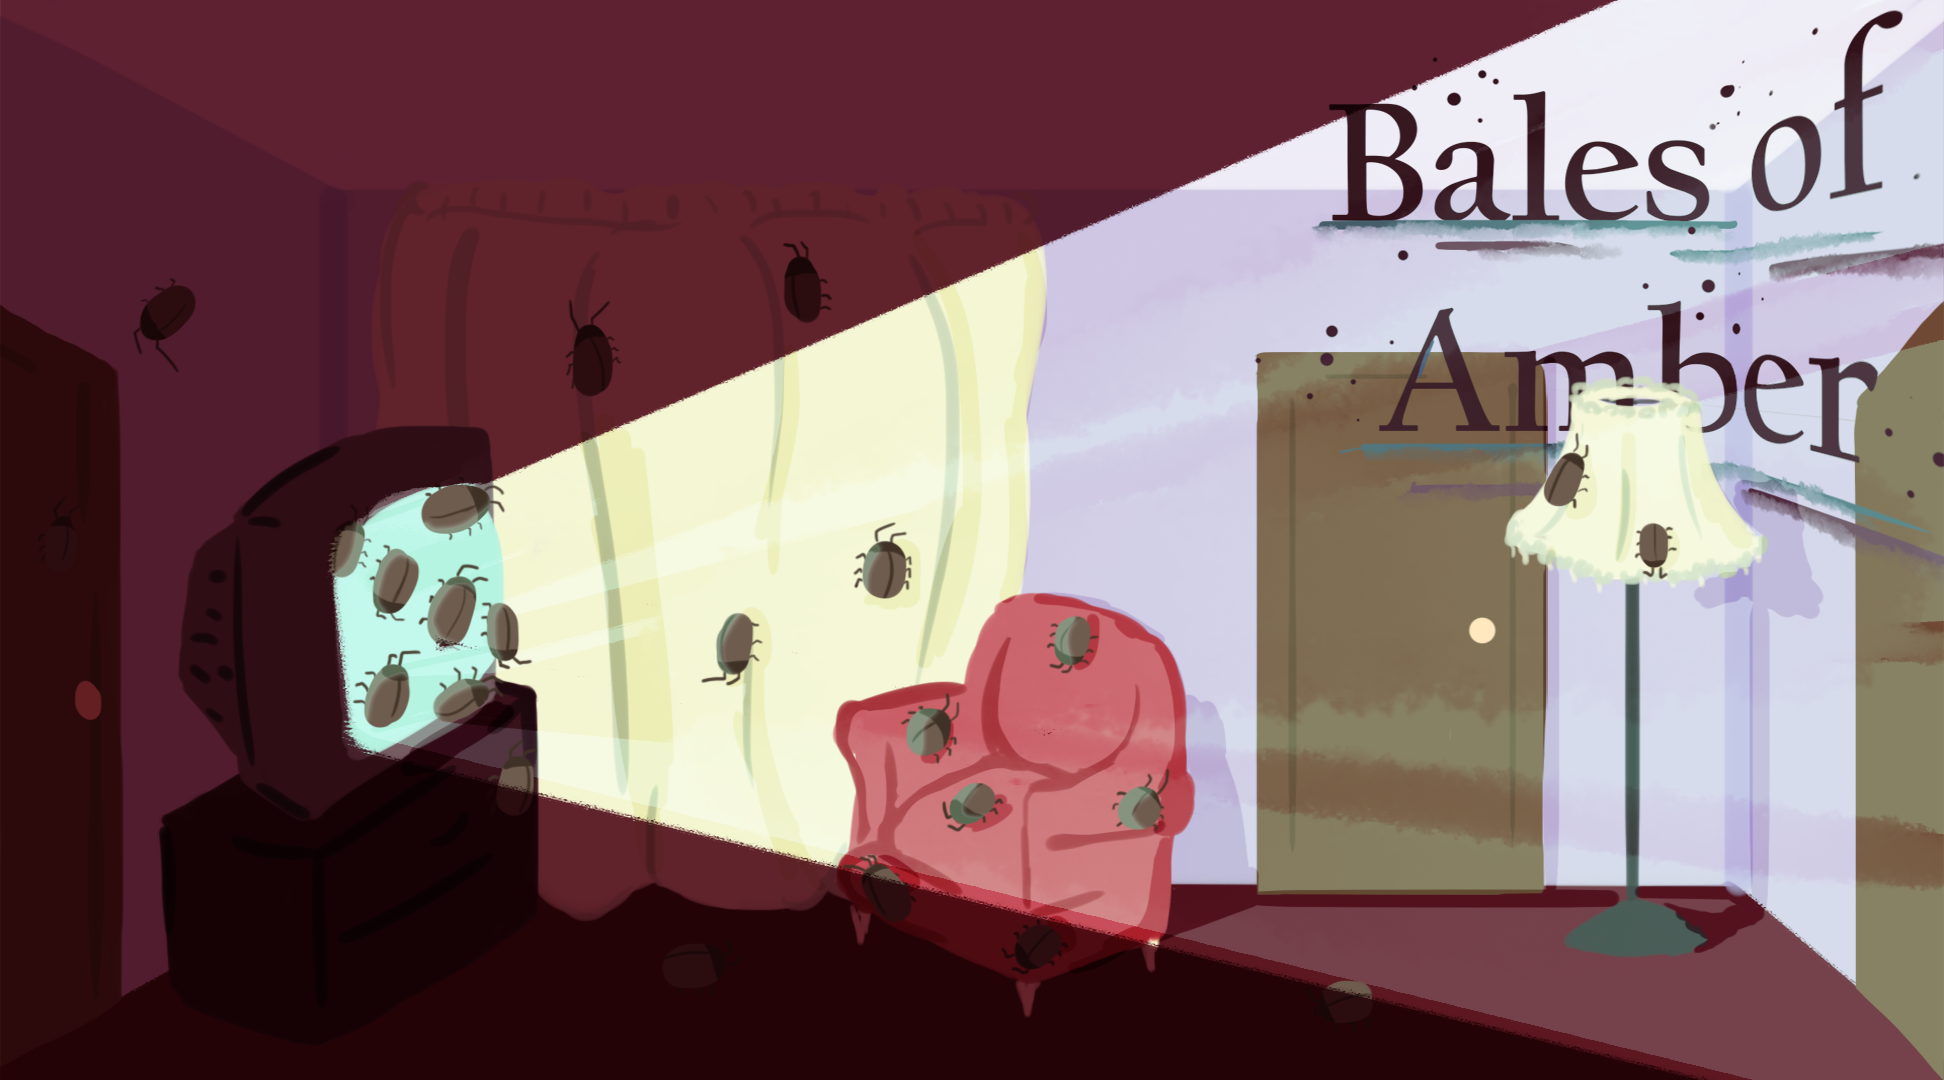 Bales of Amber